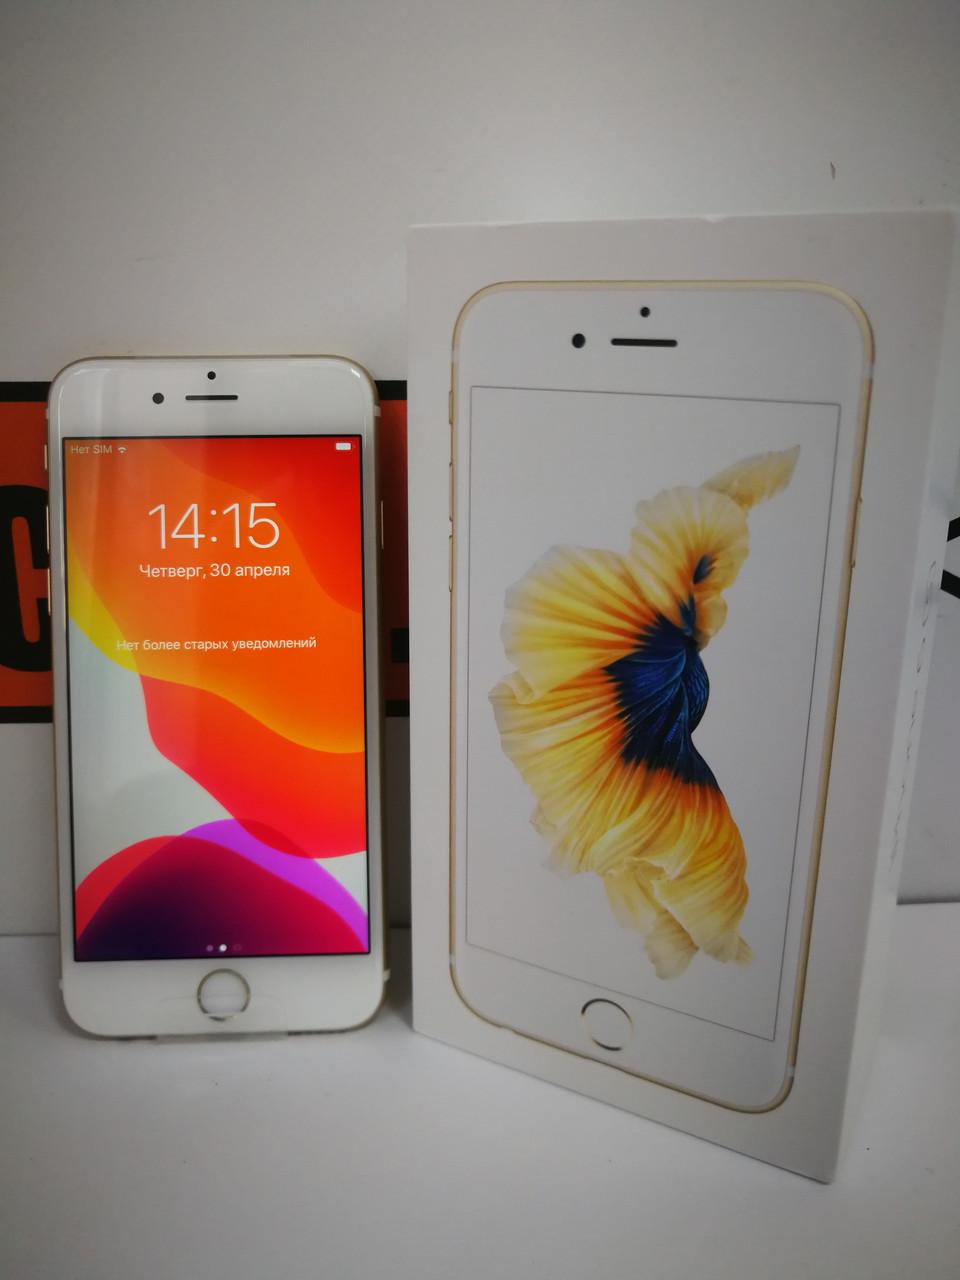 "Смартфон Apple iPhone 6S 16GB (Rose, Gold, Silver), 4.7"" IPS, Apple A9, оплата частями"